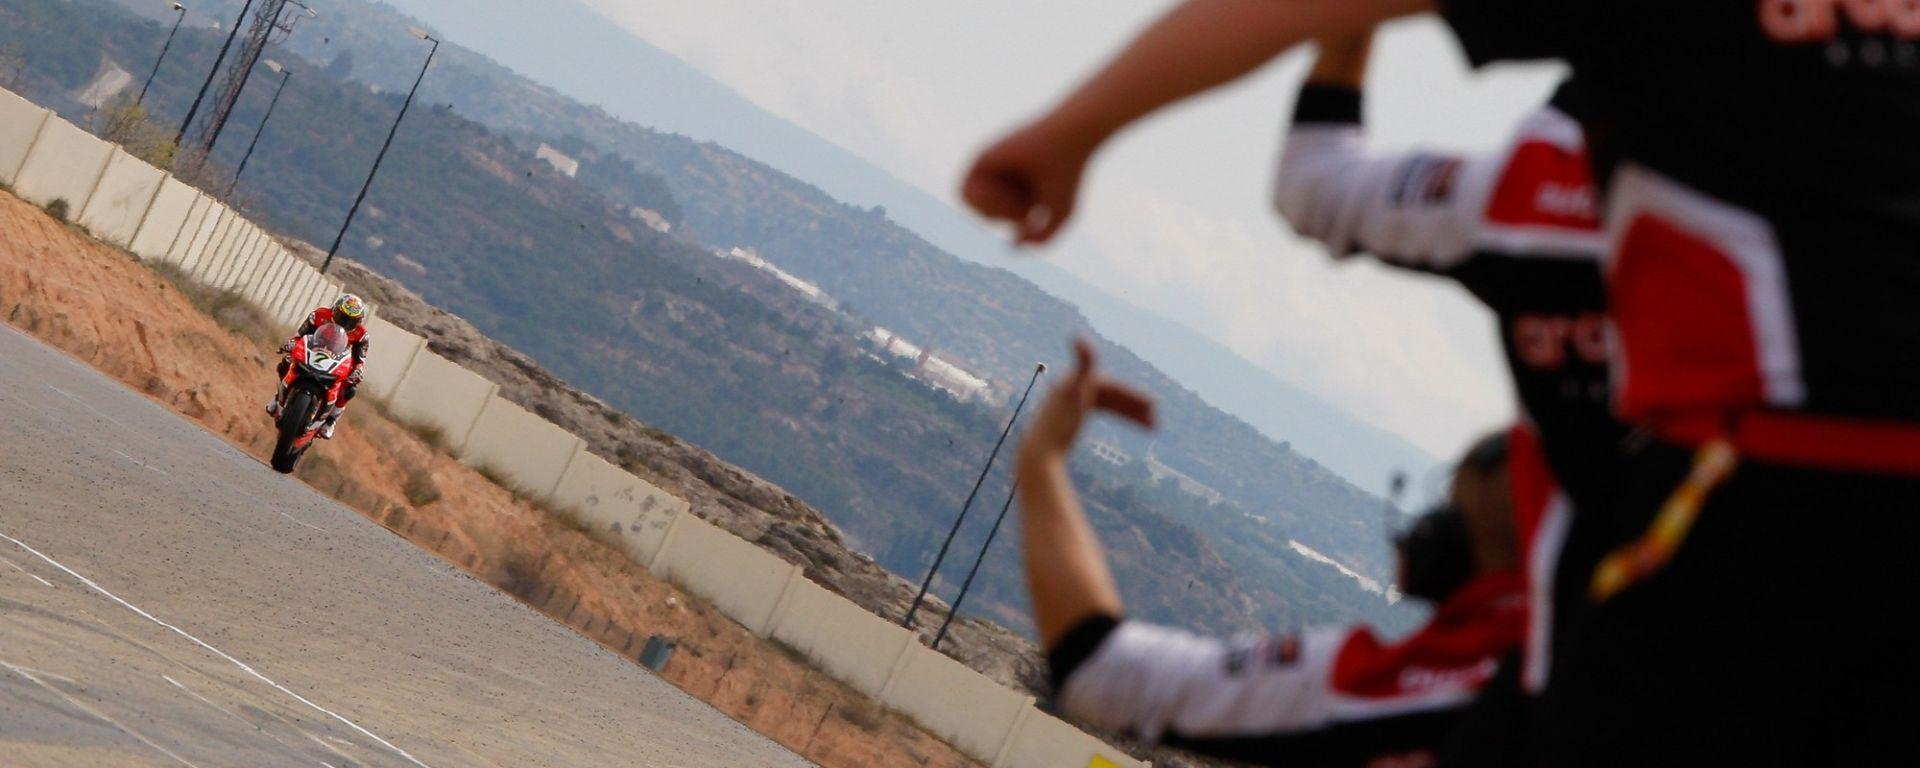 Superbike 2017 round 3 Gran Premio d'Aragona Spagna: prove libere, qualifiche, Gara 1 e Gara 2